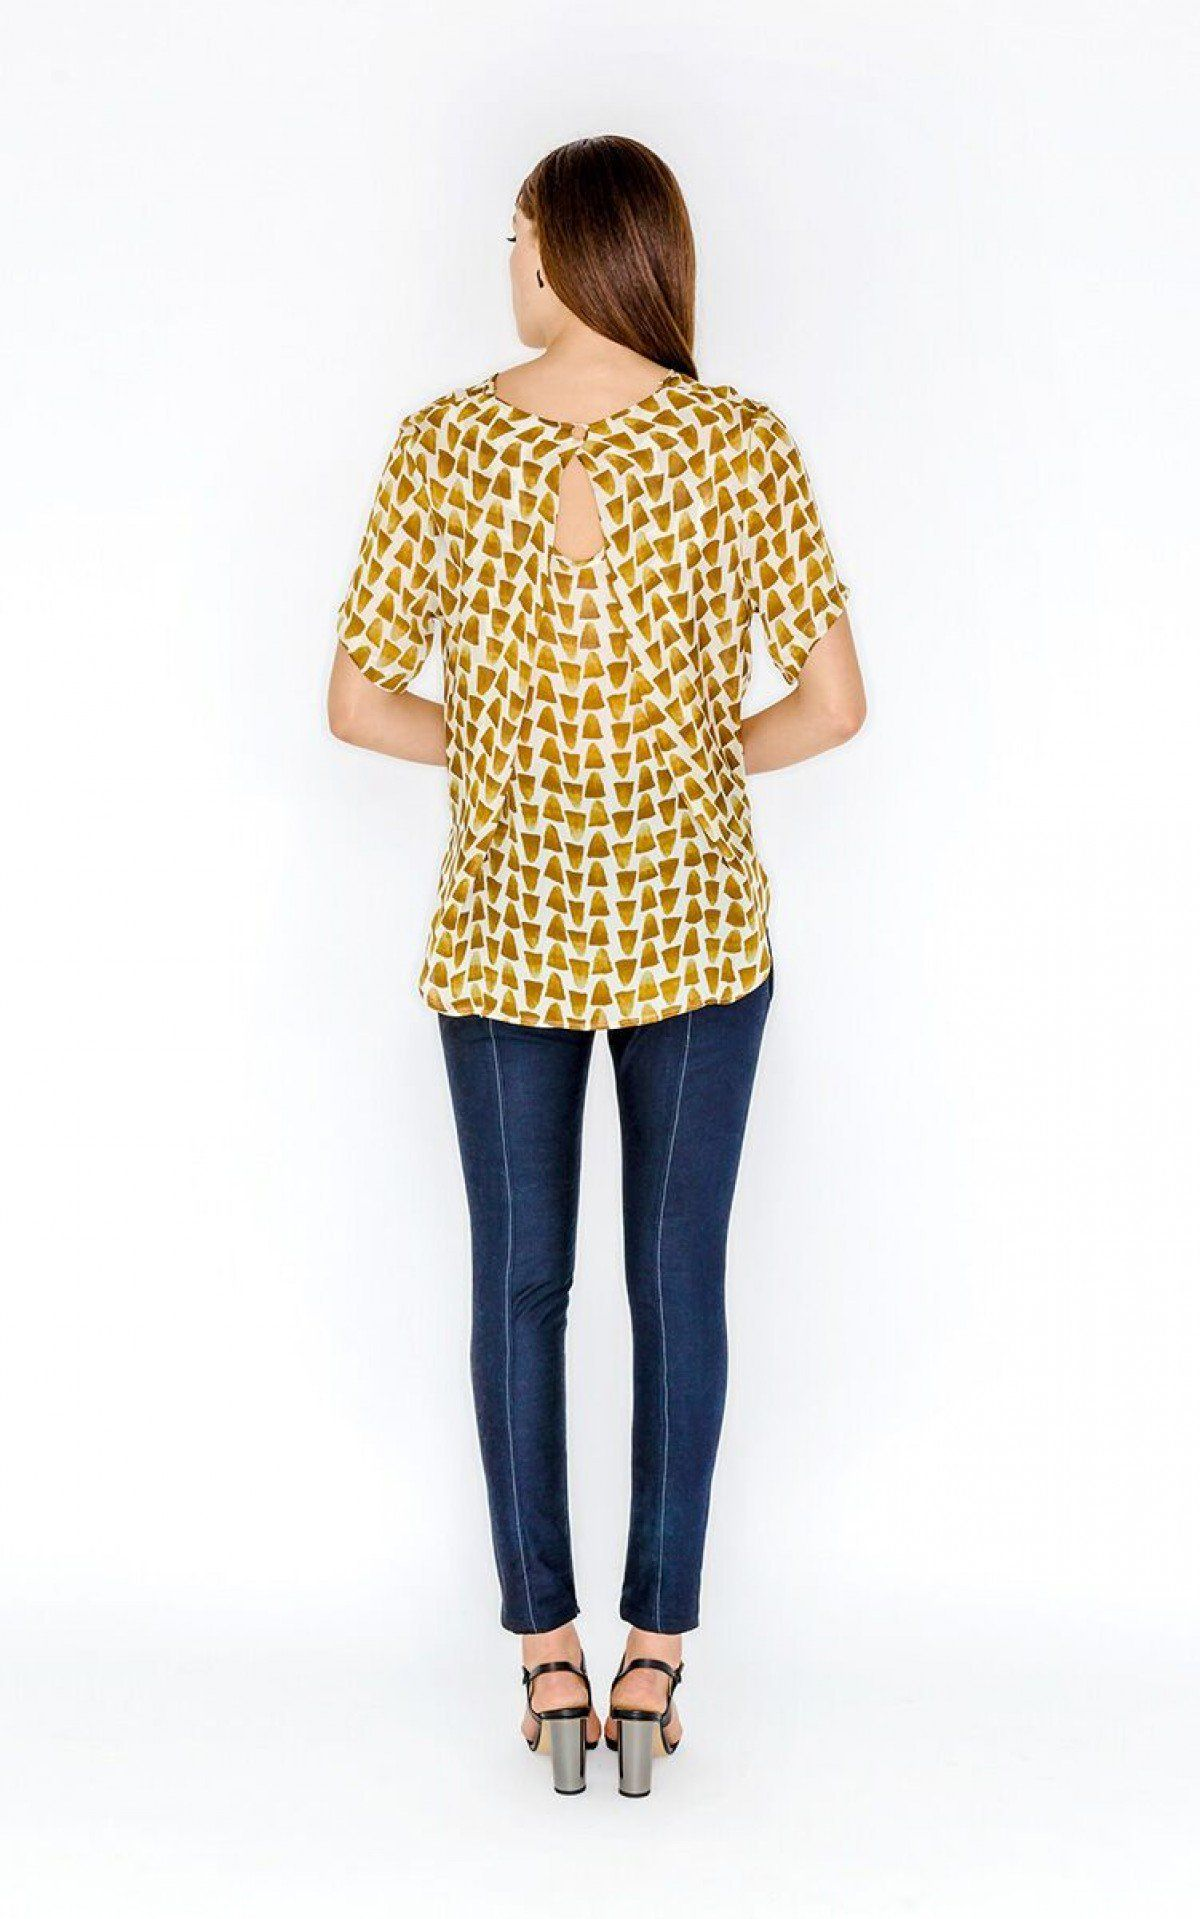 84420a4ea80a6 Papercut Kobe Dress  Top Pattern - Harts Fabric